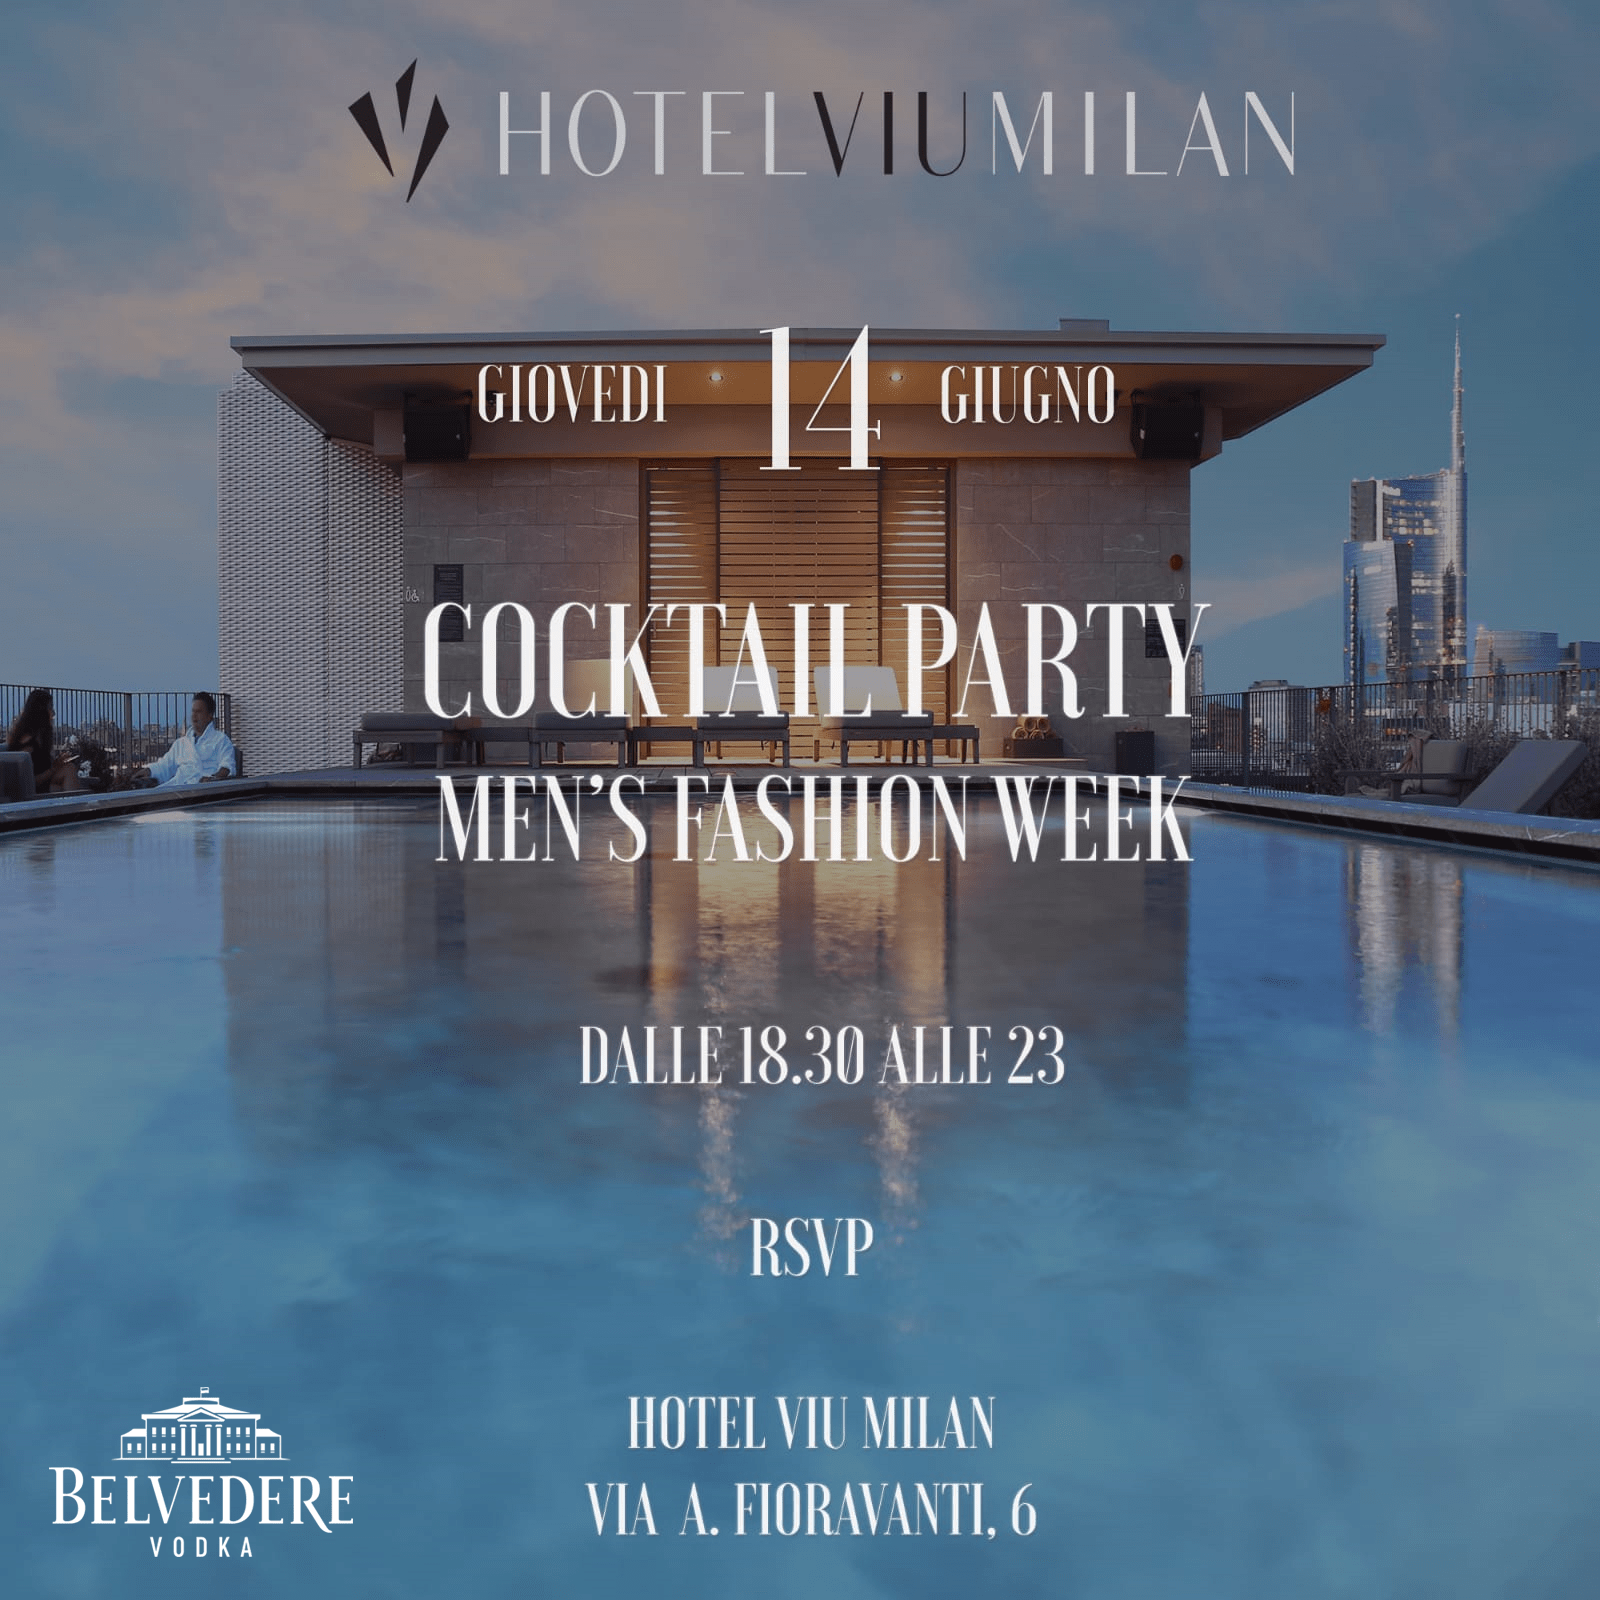 FLYER HOTEL VIU MILANO